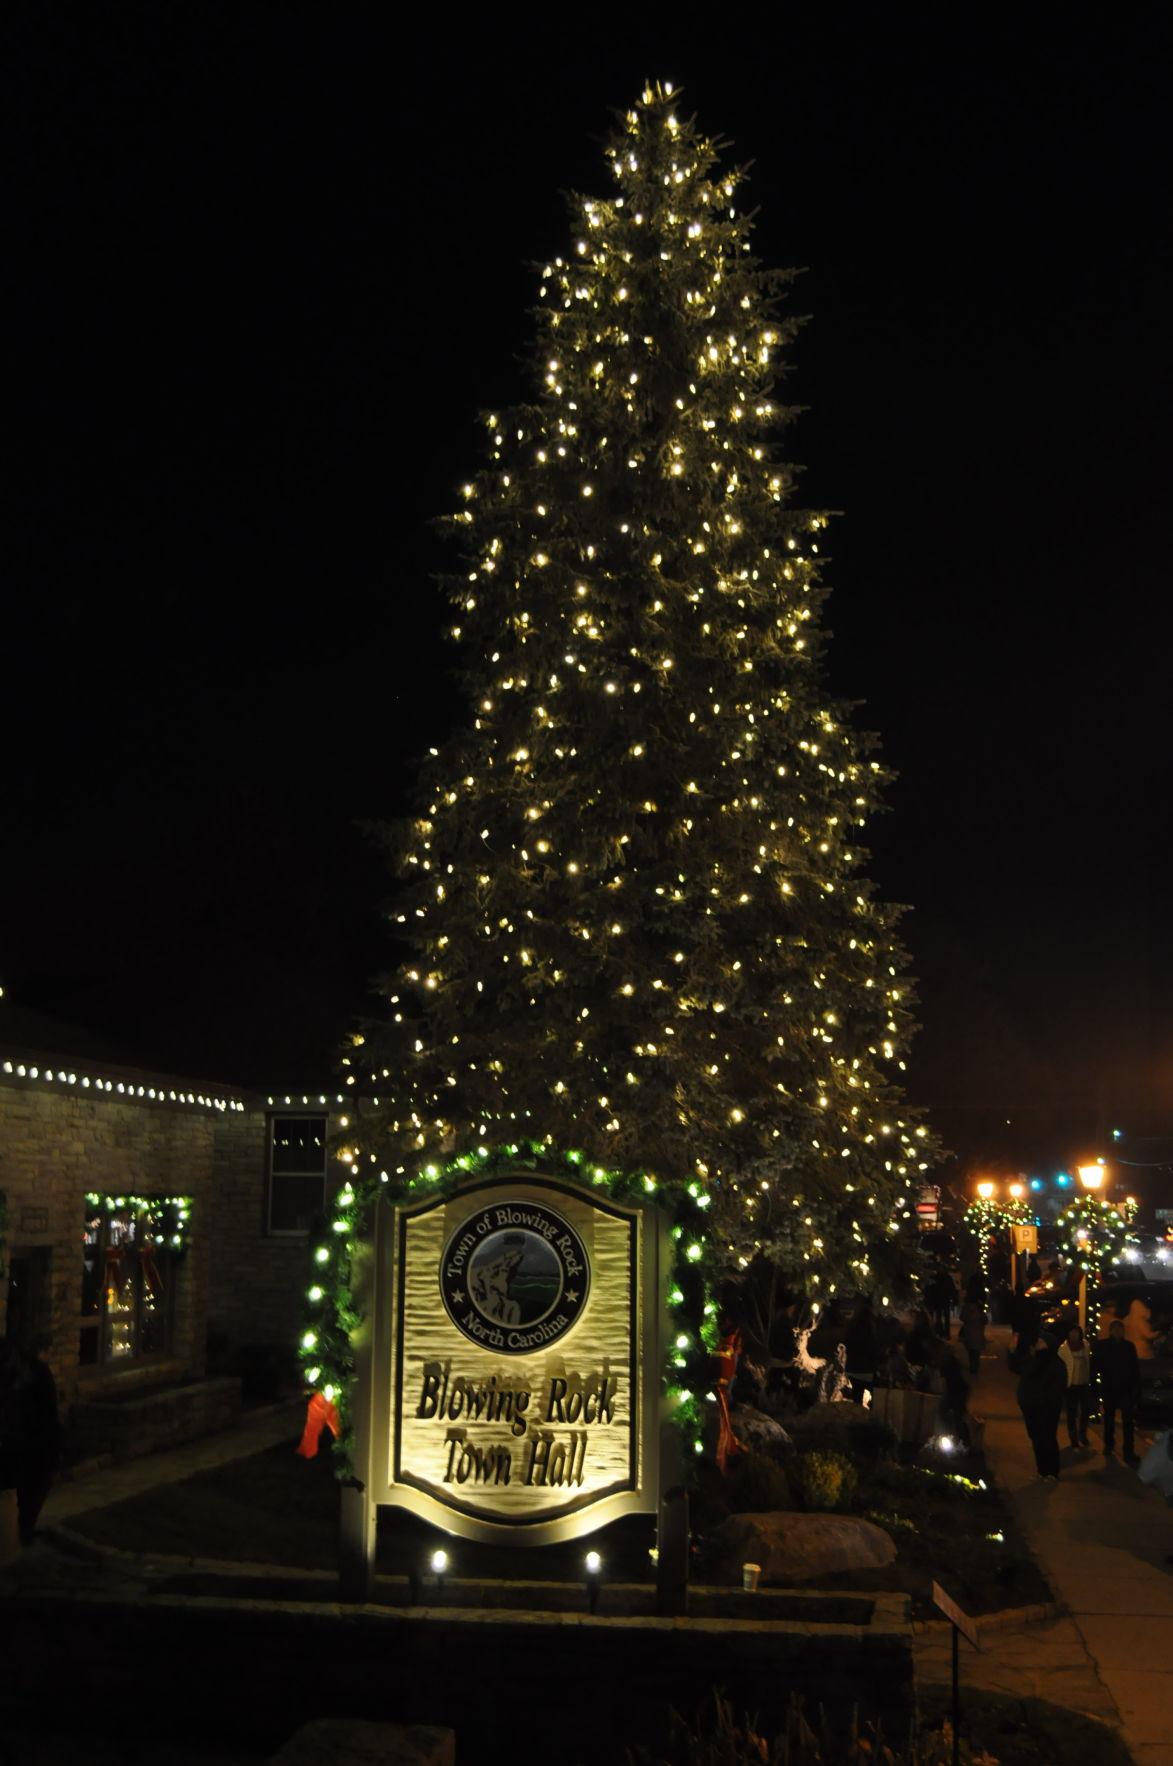 Town Hall tree